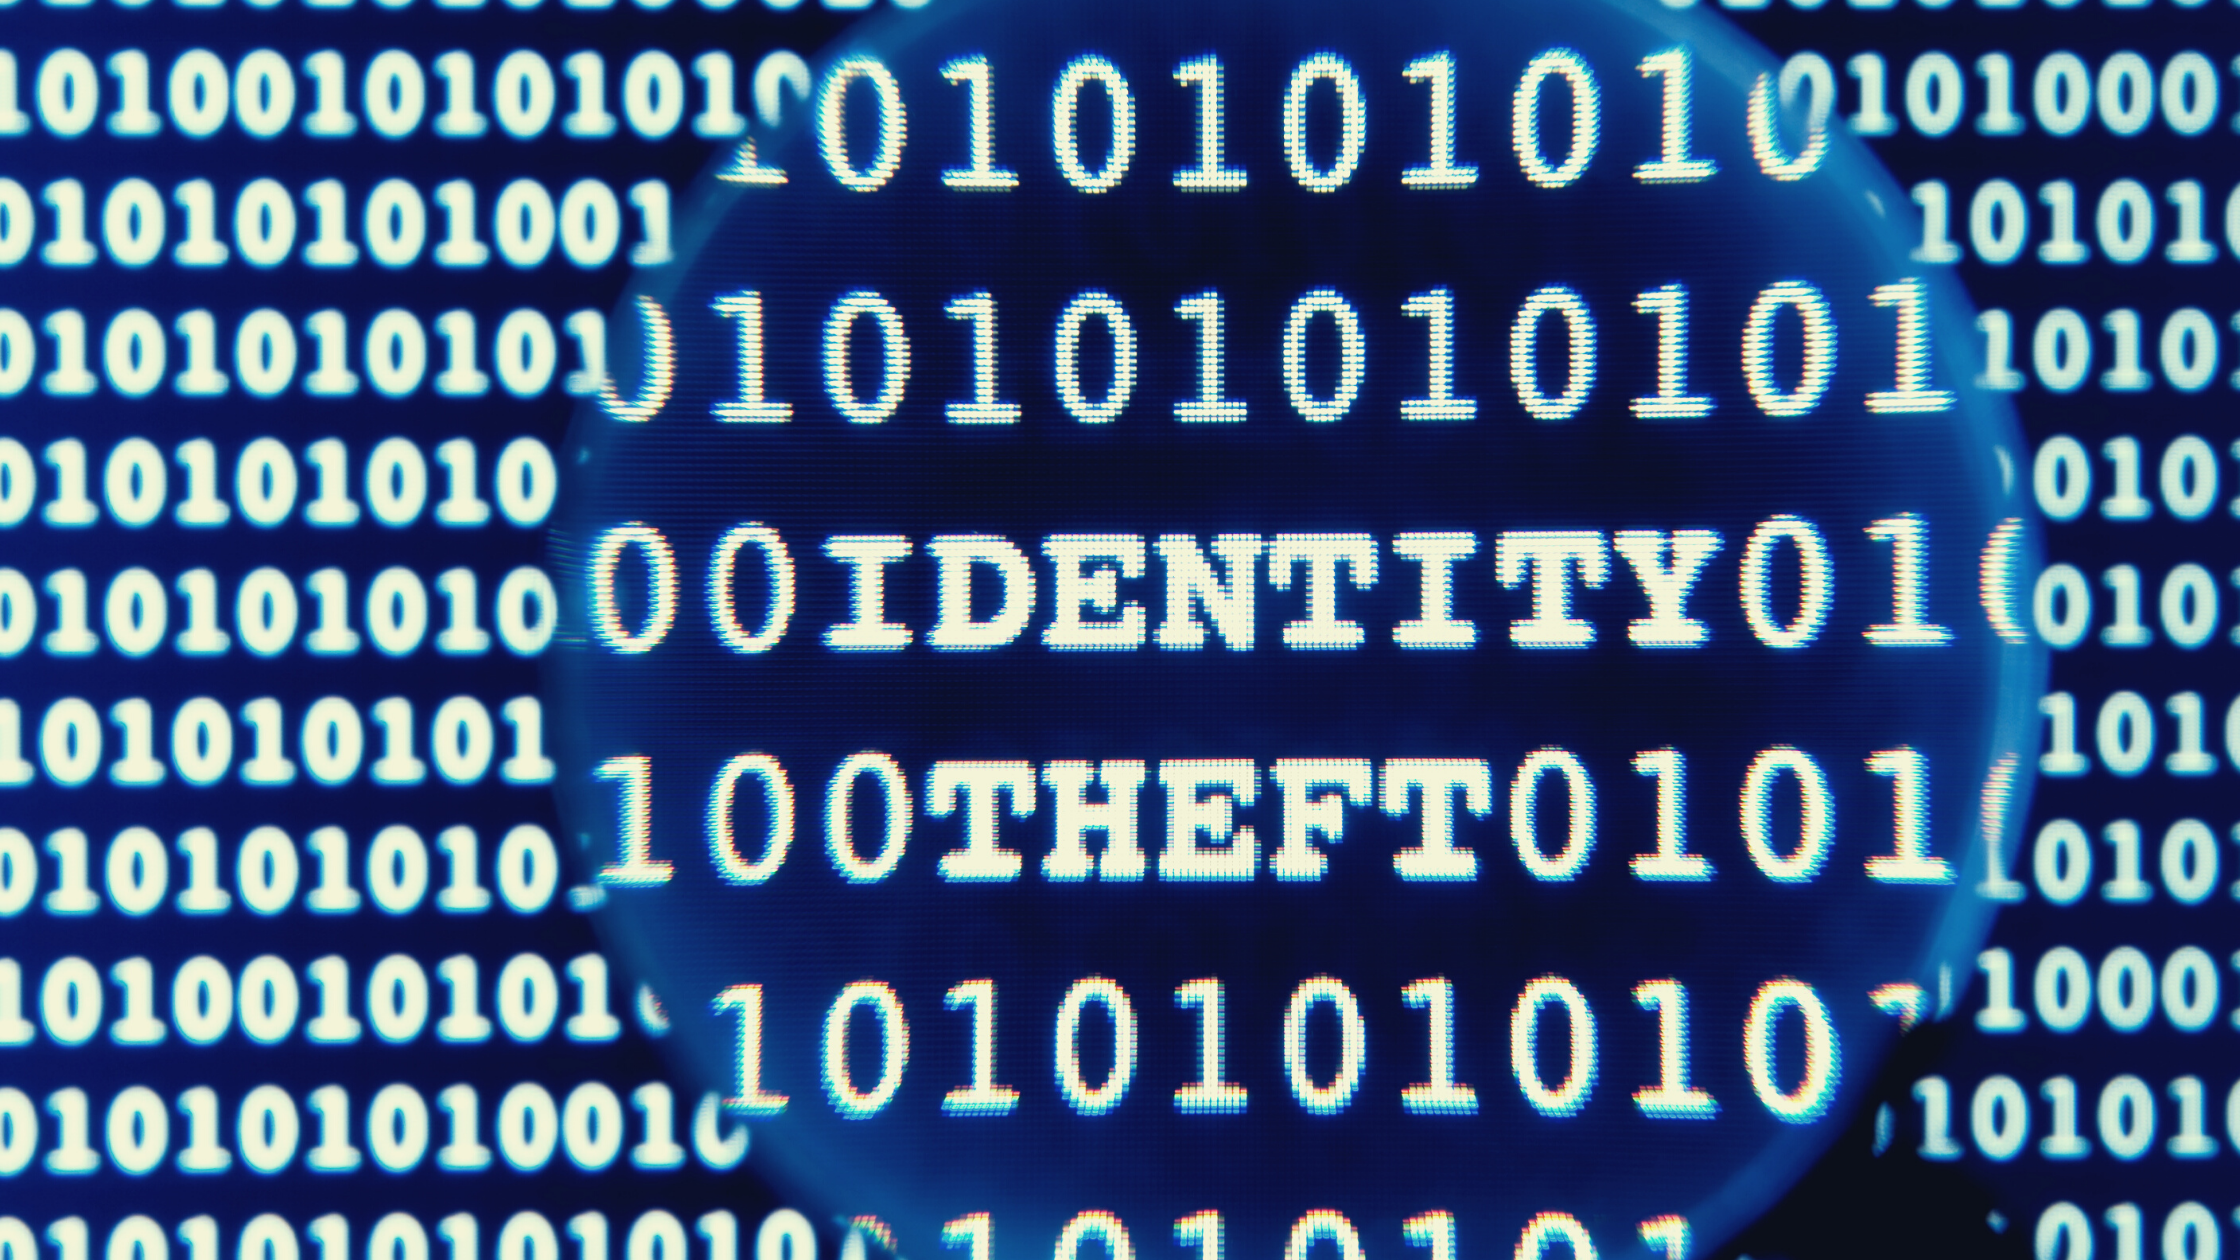 KAPED Trak: Benefits of Identity Theft Protection